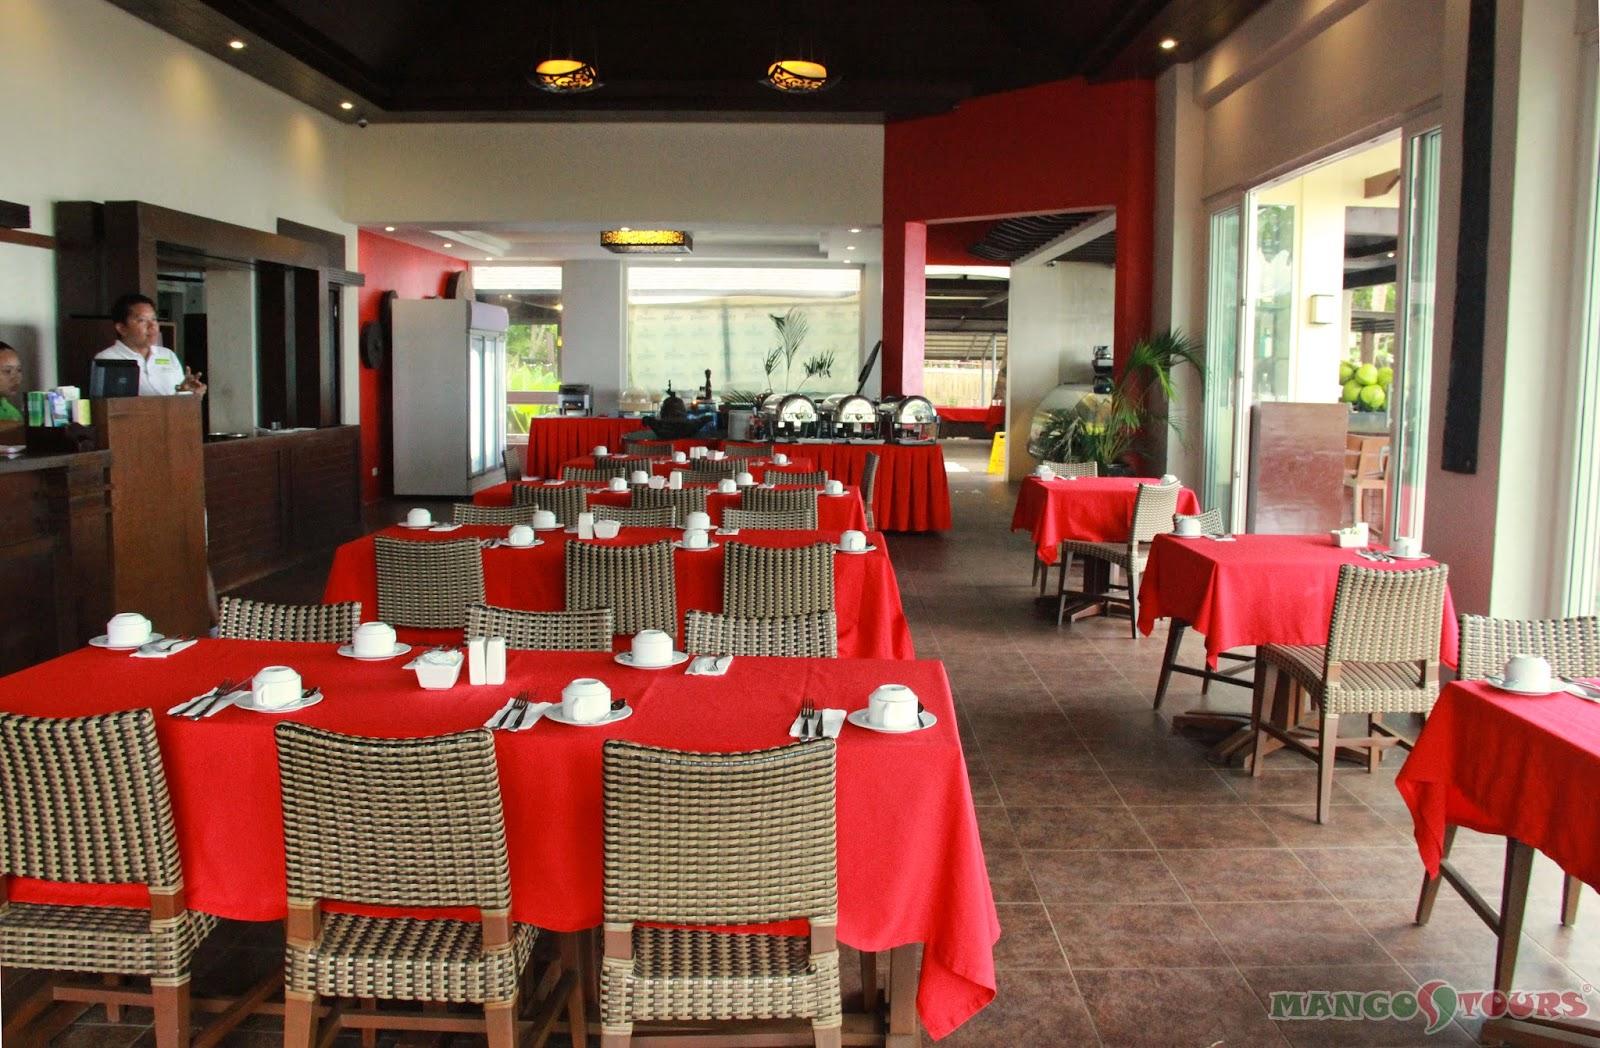 Mango Tours Philippines Sheridan Beach Resort & Spa South Sea Restaurant Puerto Princesa Palawan